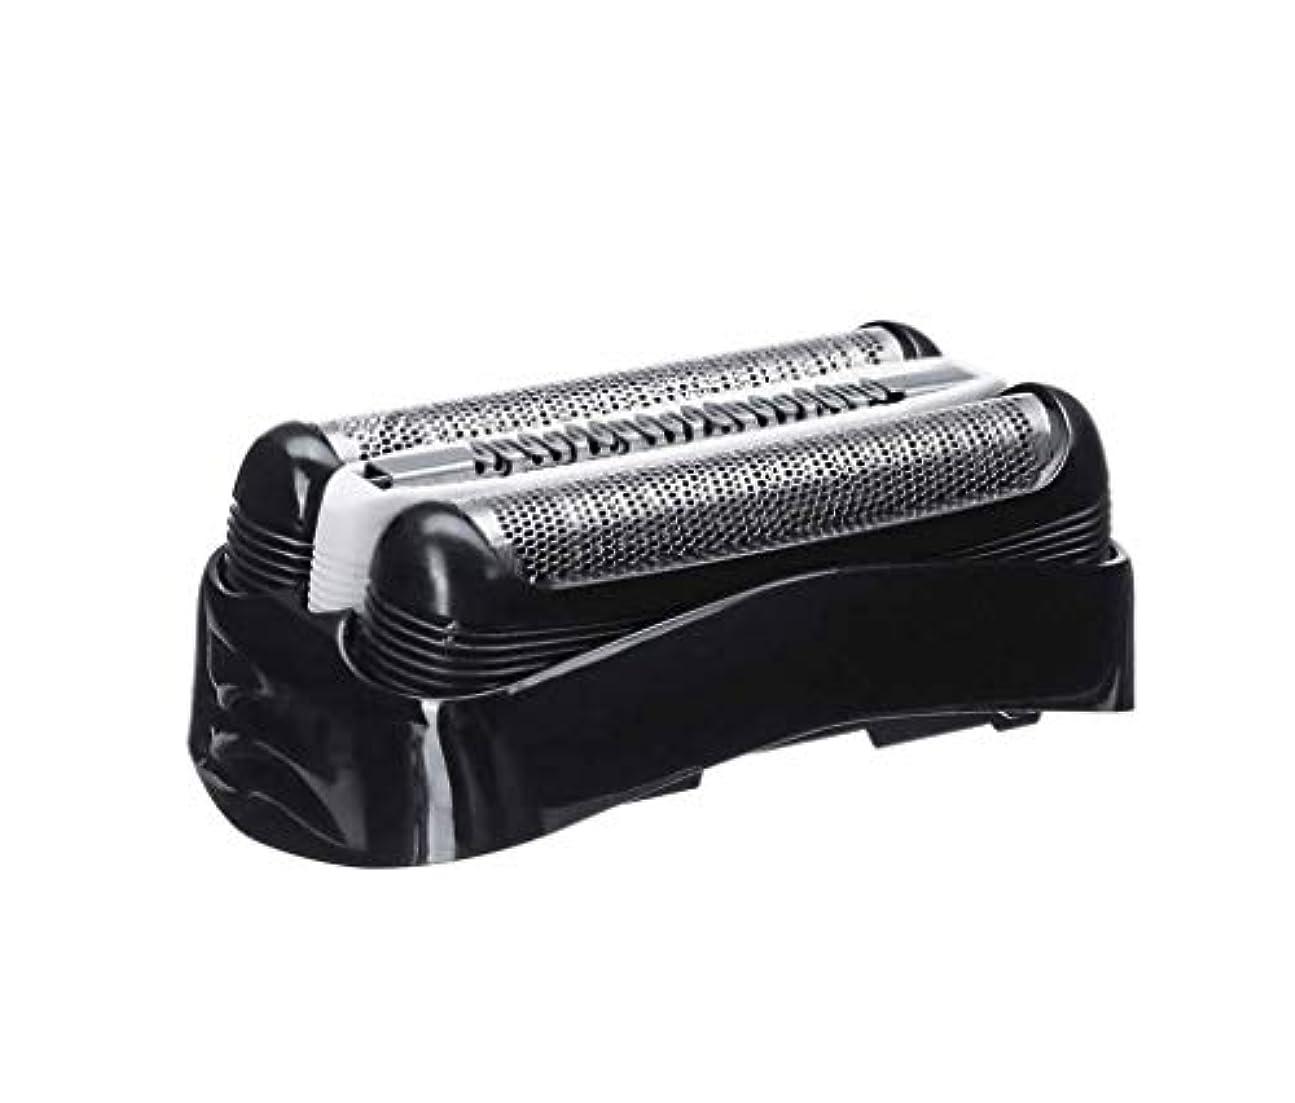 SHEAWA ブラウン シェーバー対応替刃 シリーズ3用 32B ブラック Braunシェーバー専用